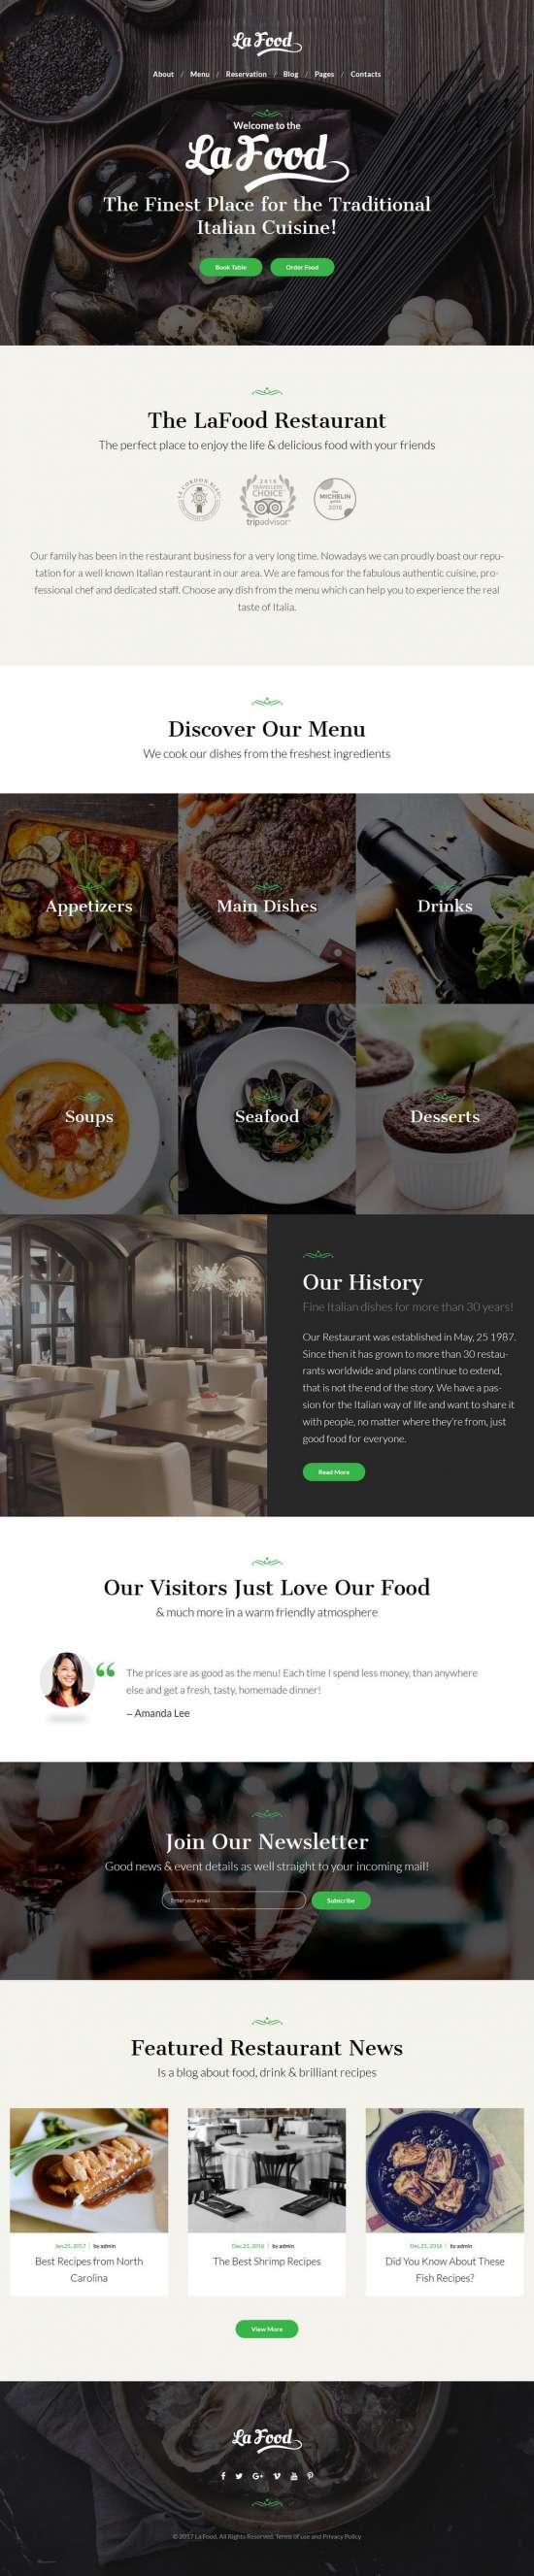 la food wordpress theme restaurants 01 550x2654 - La Food WordPress Theme